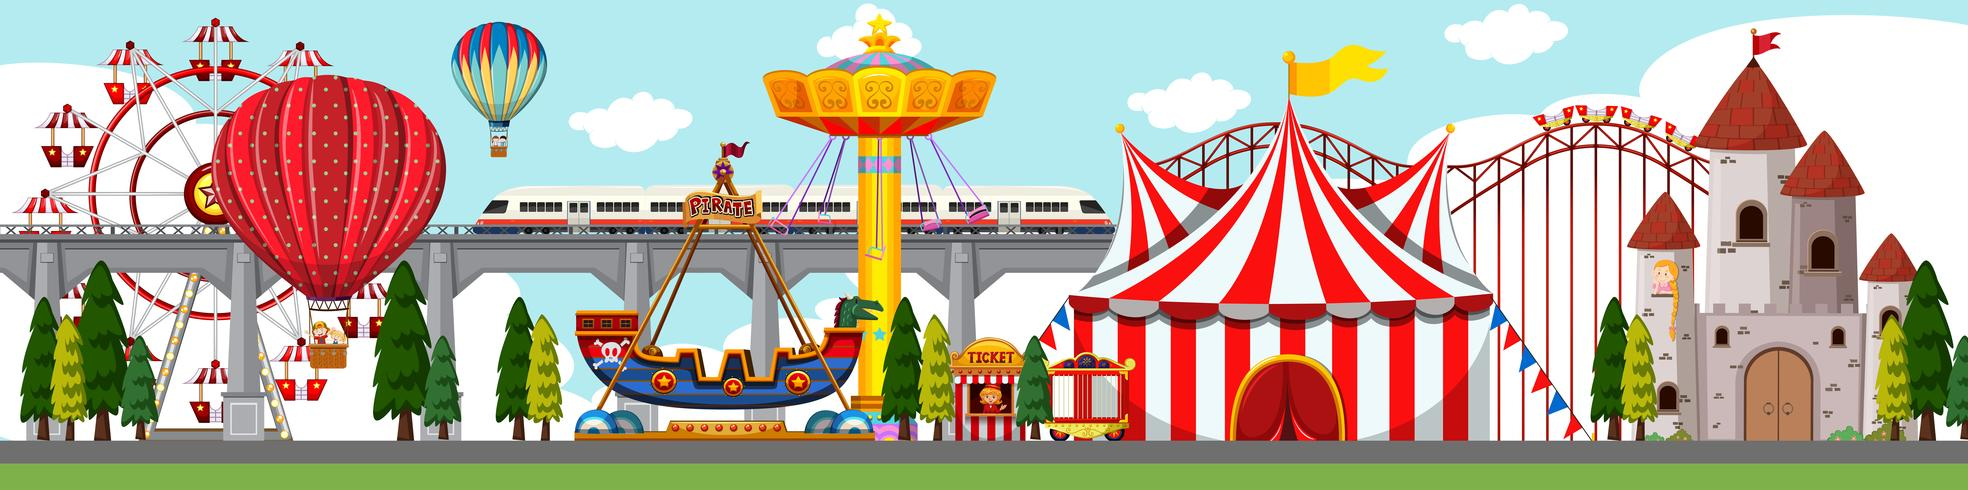 A amusement park scene